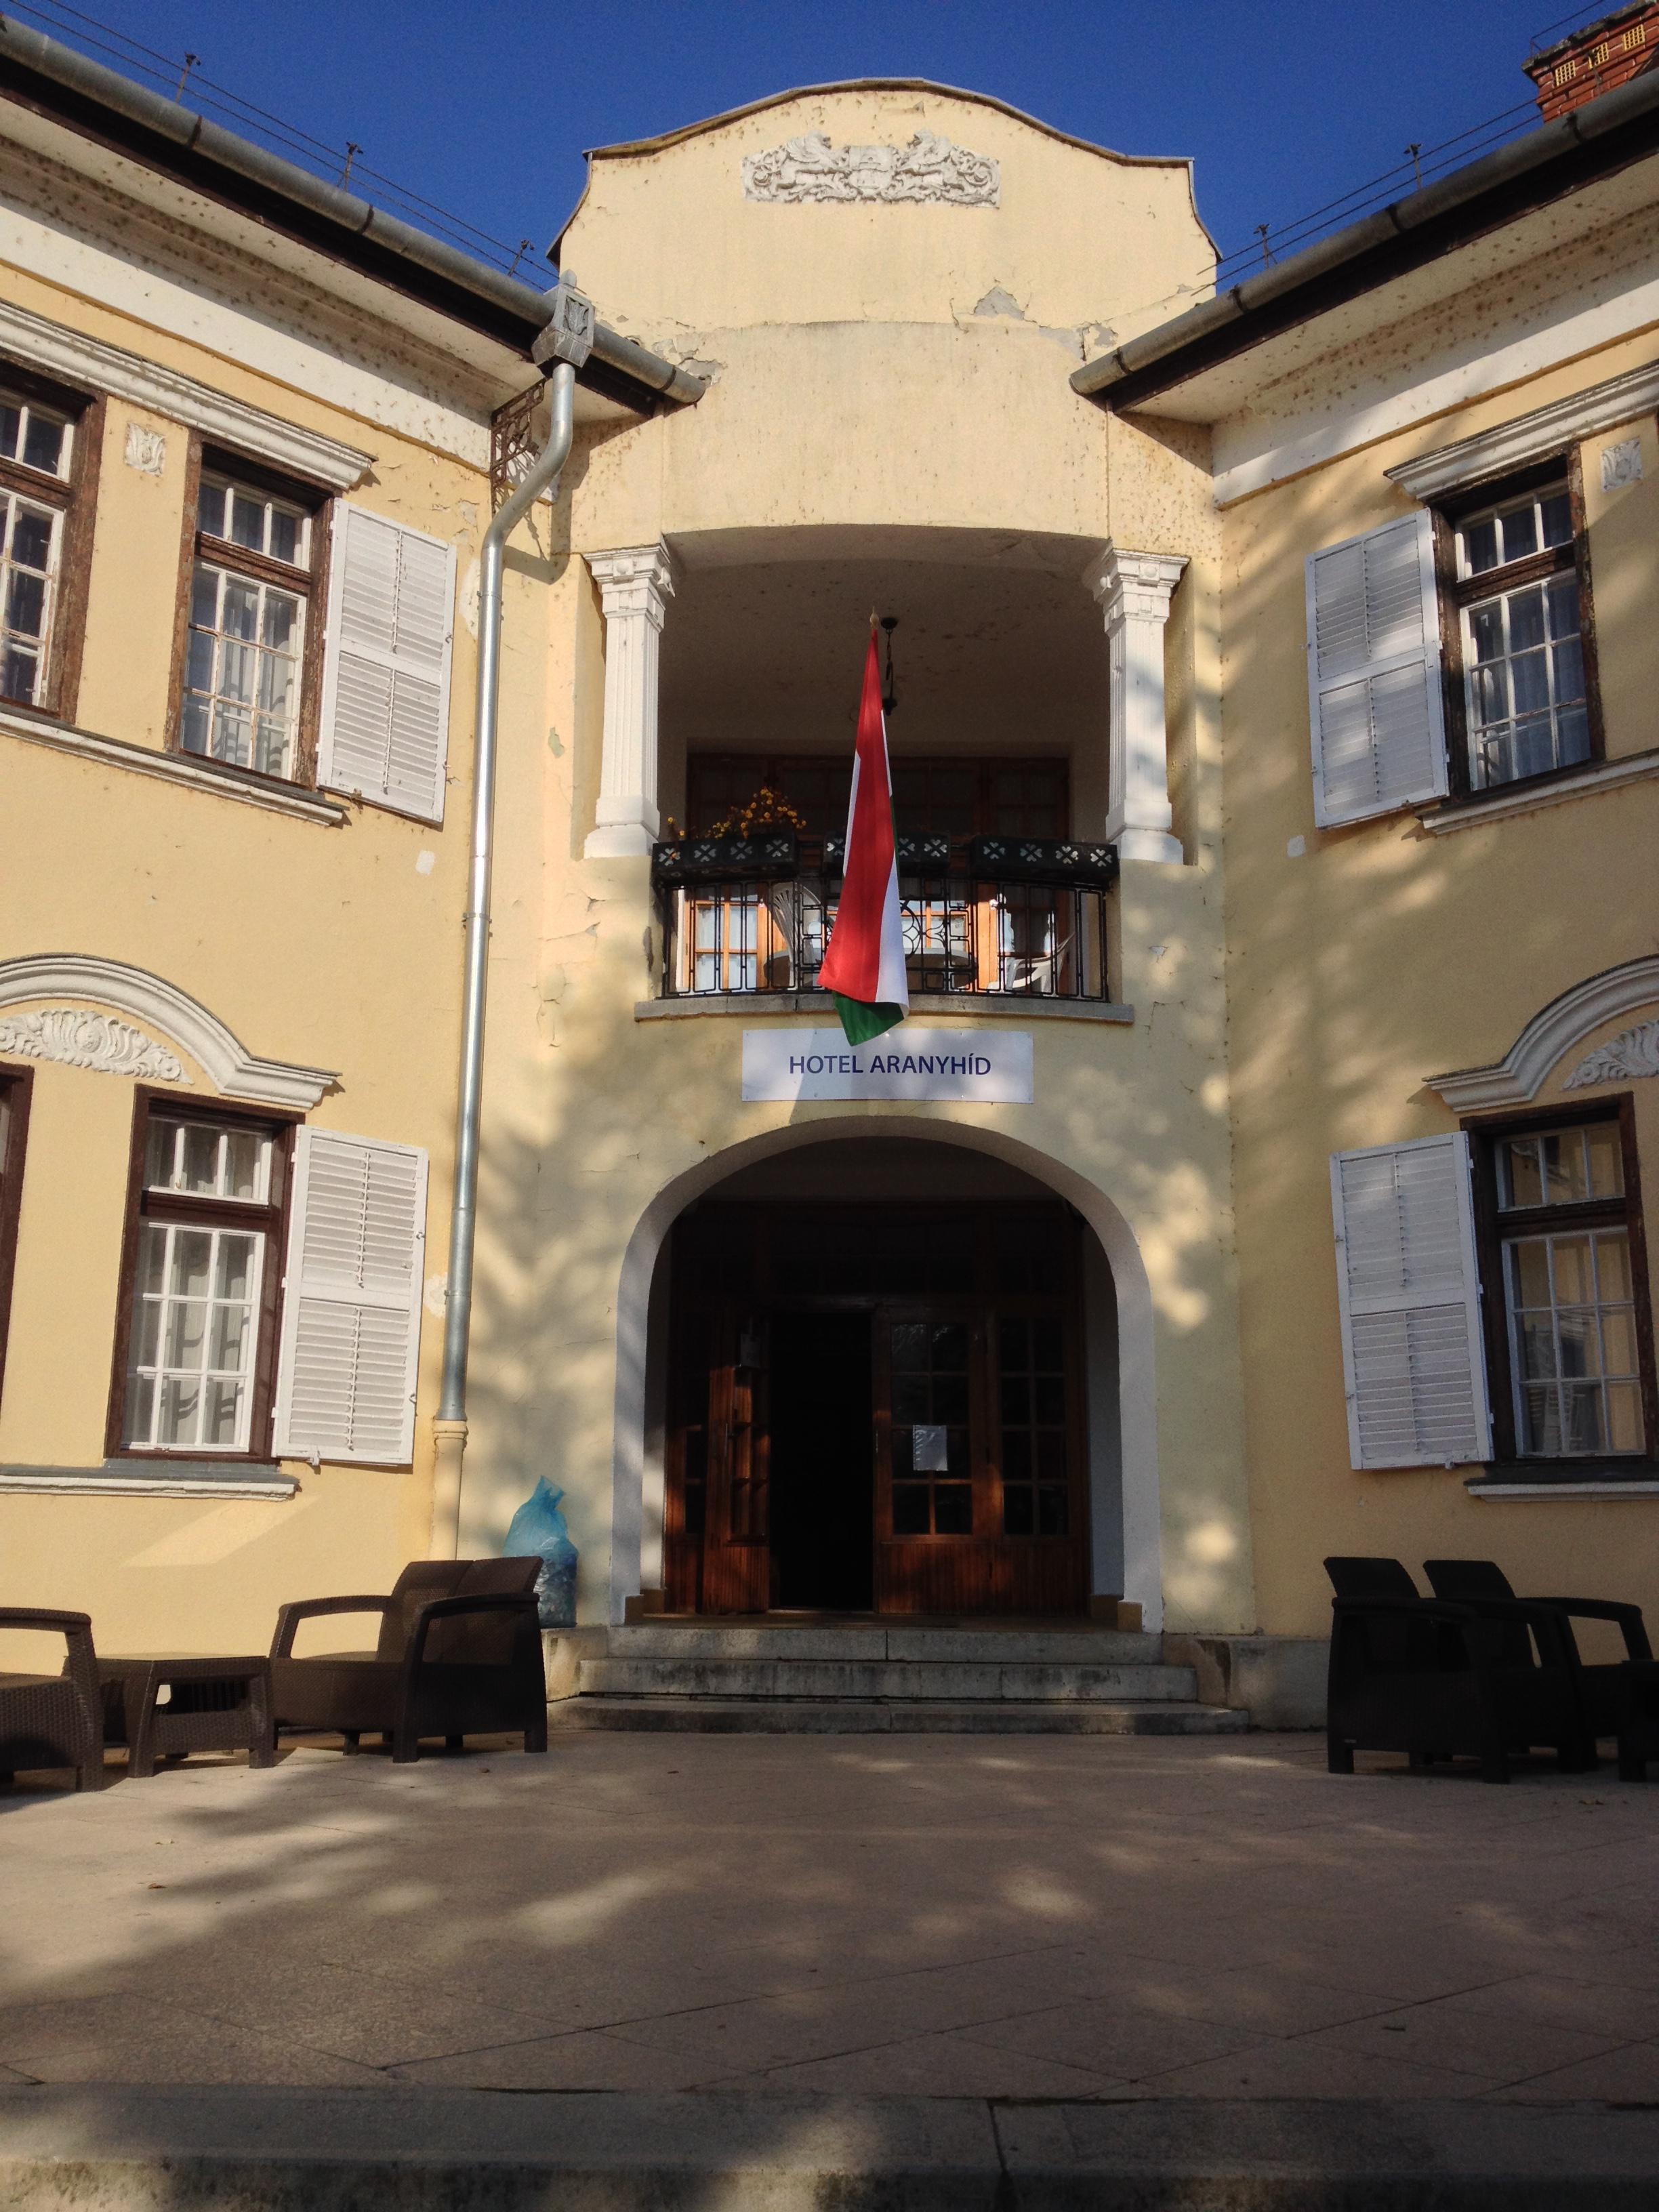 Hotel Aranyhid